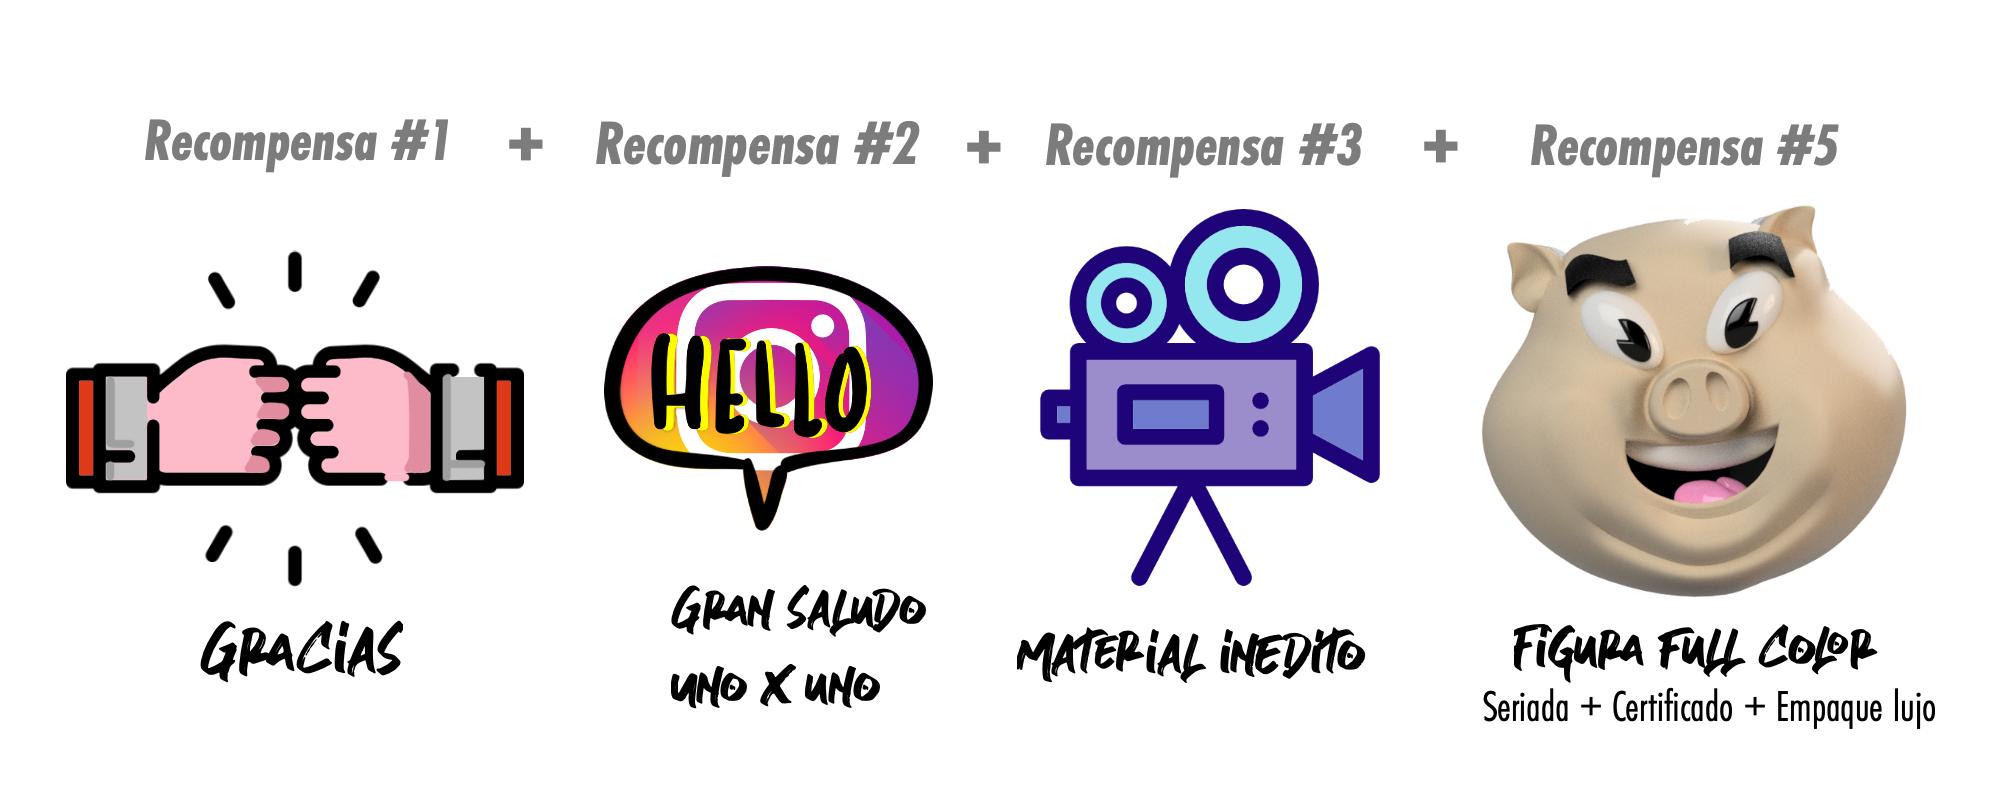 recompensas_combinadas_2.png